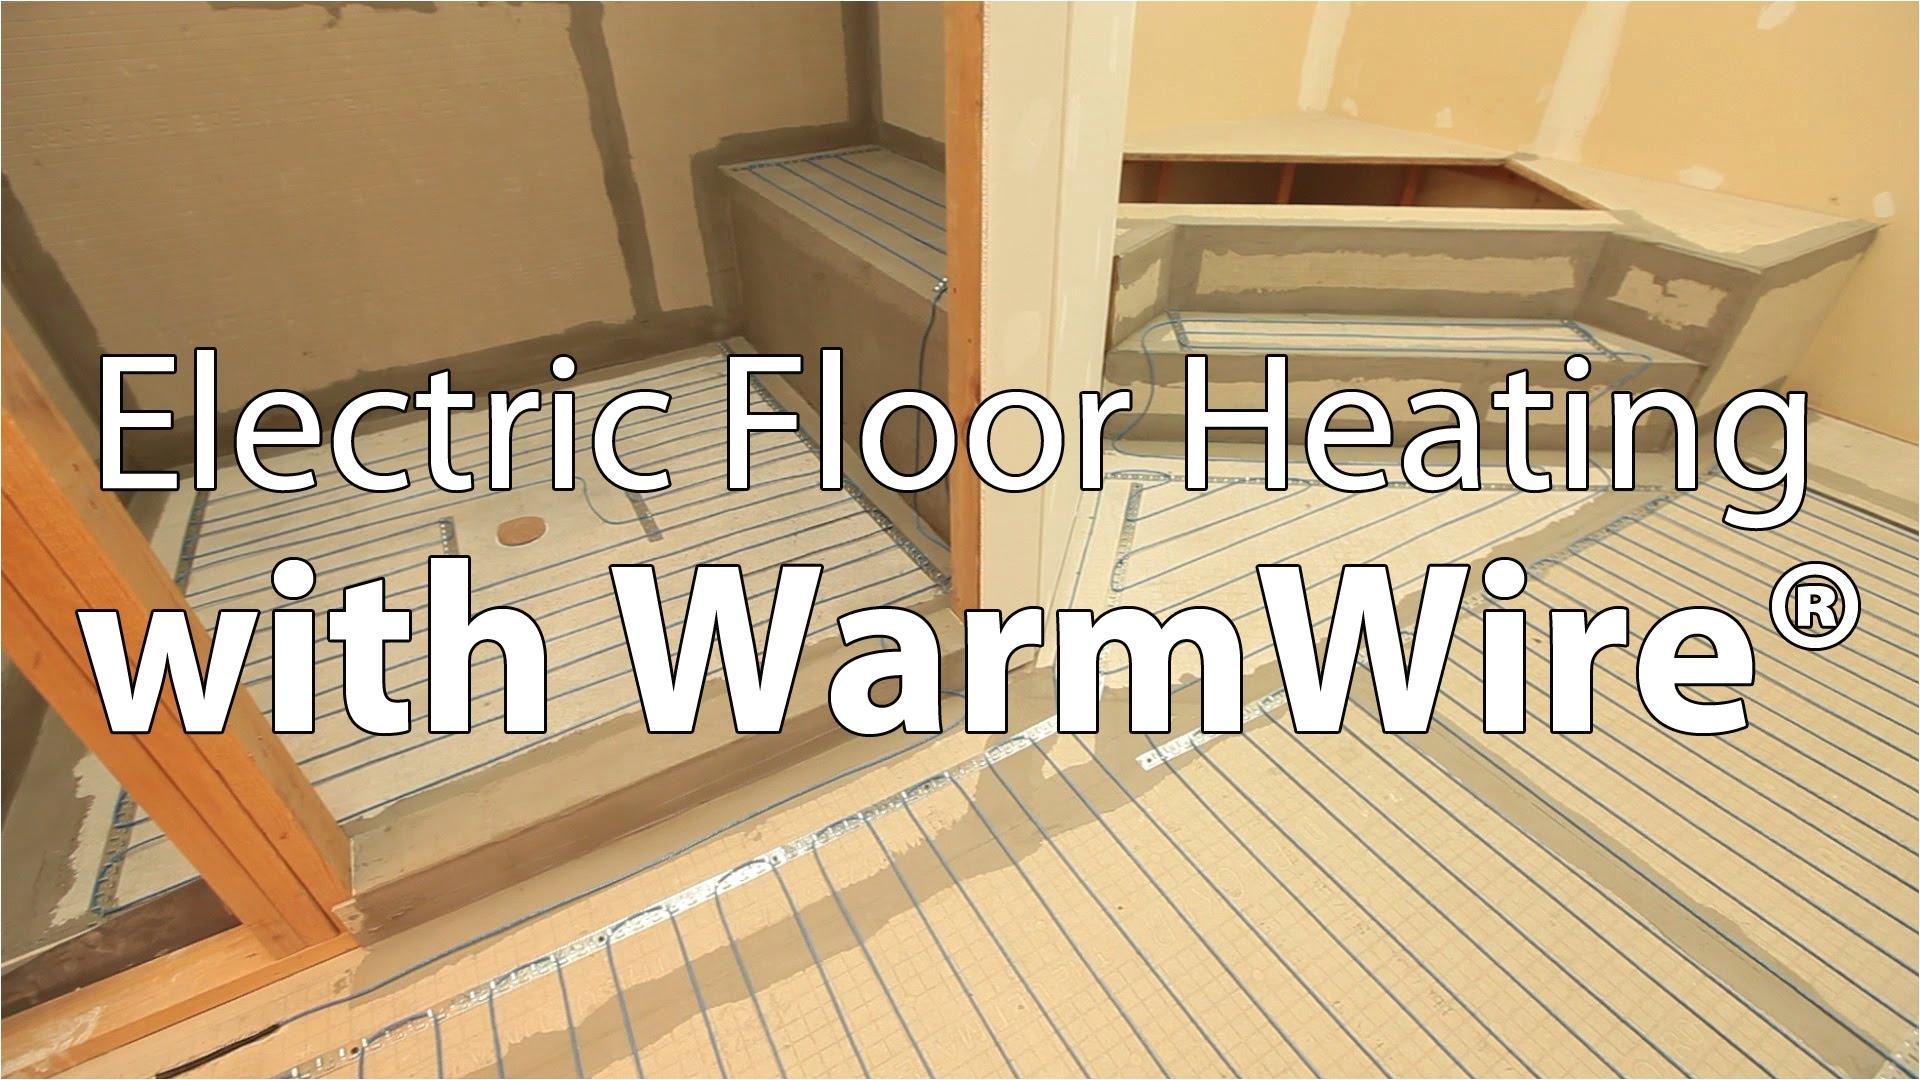 Suntouch Heated Floor System Electric Floor Heating with Suntoucha Warmwirea Youtube